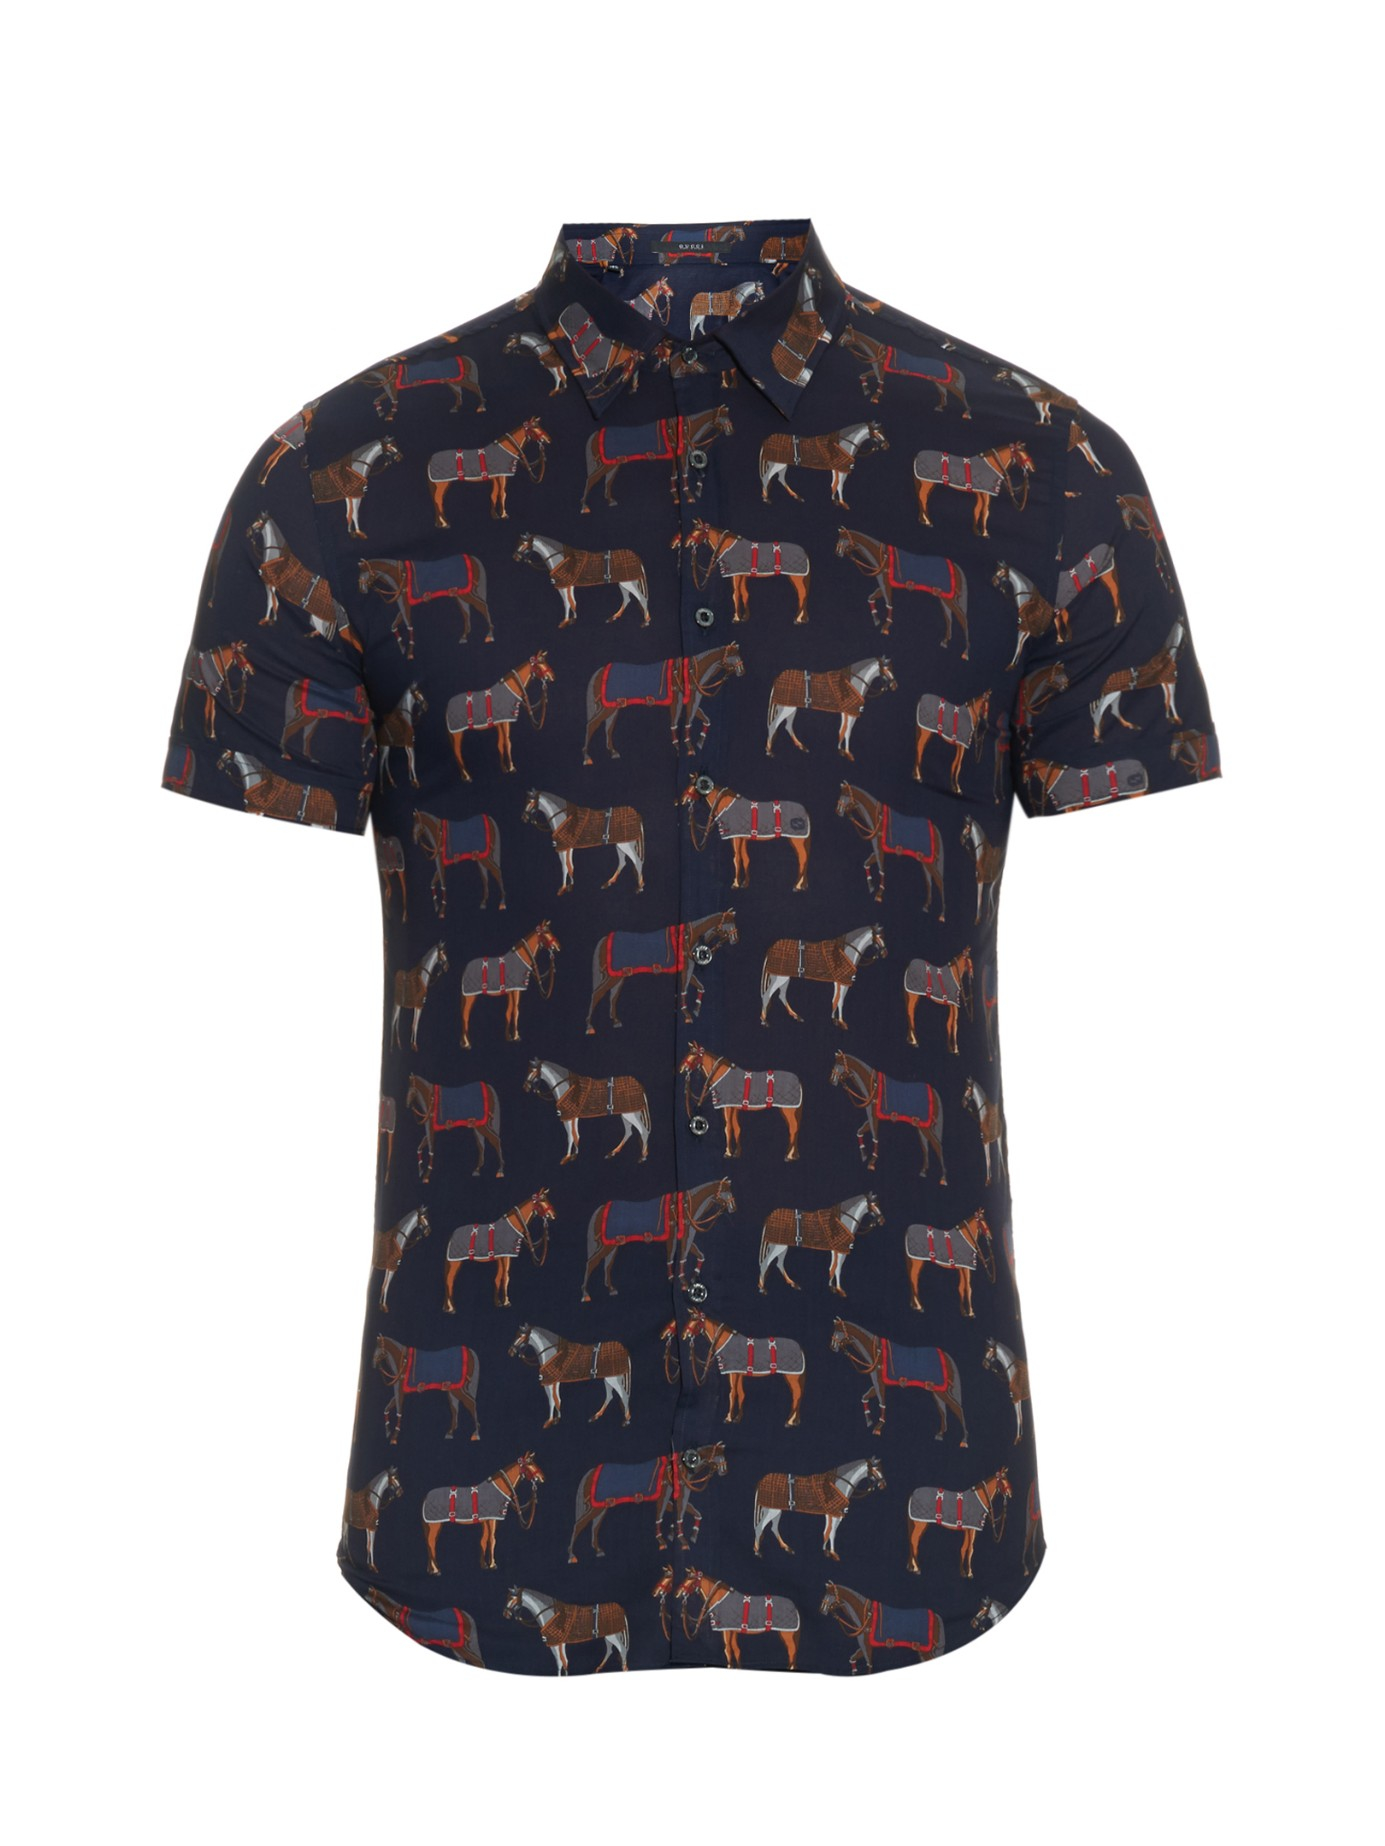 655a597c2da4 Lyst - Gucci Horse-print Cotton Shirt in Blue for Men